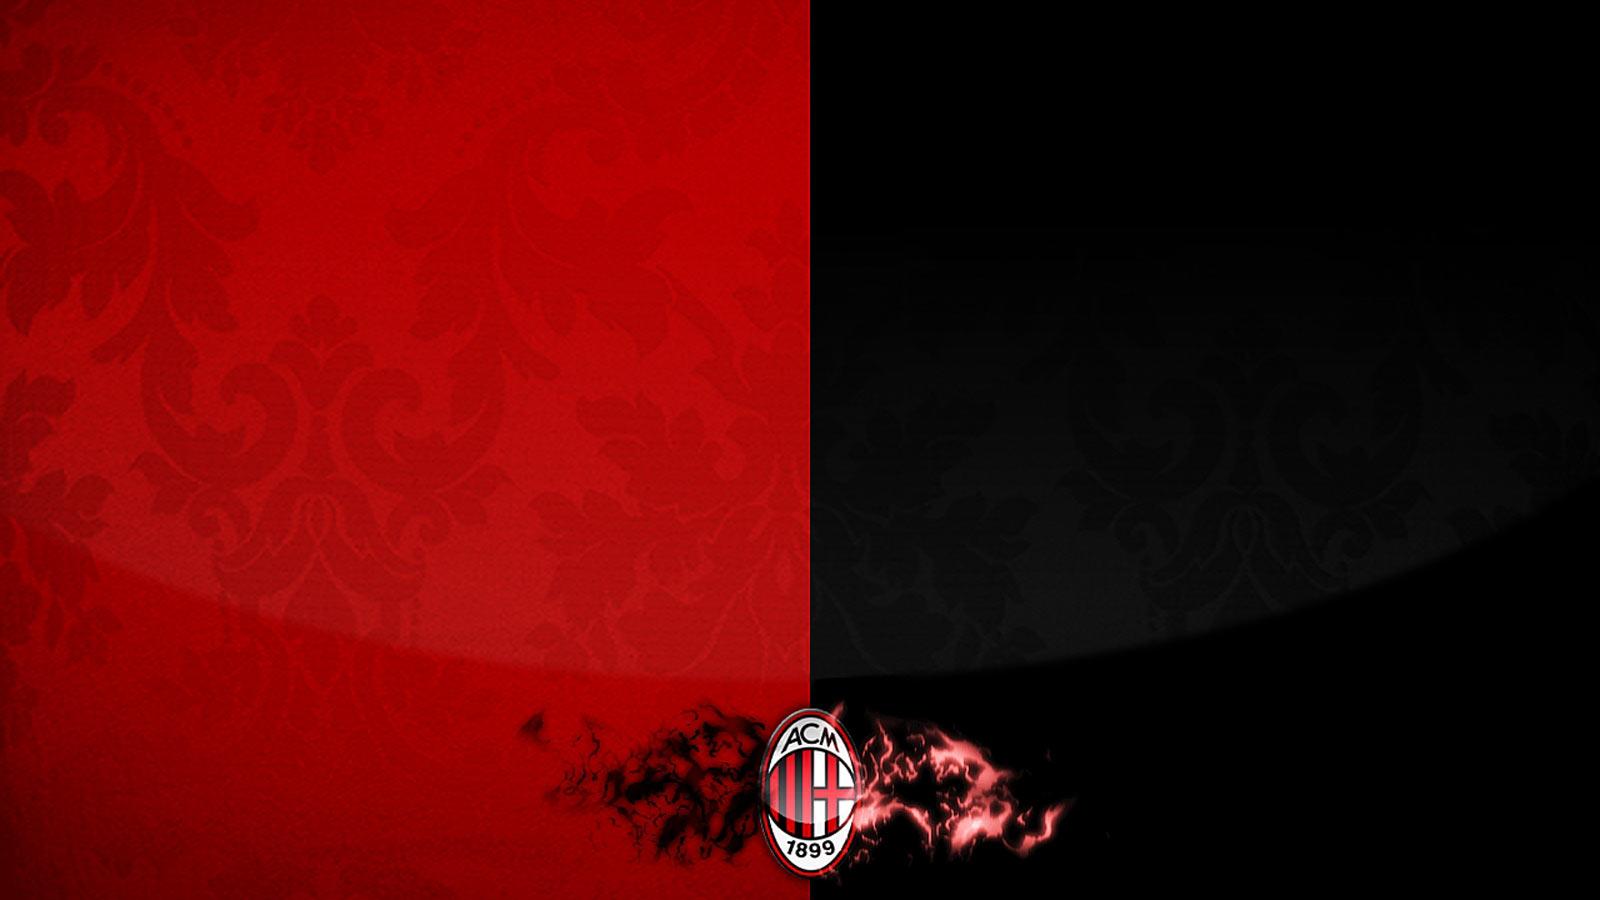 Ac Milan Wallpaper 25972 Hd Wallpapers in Football   Imagescicom 1600x900